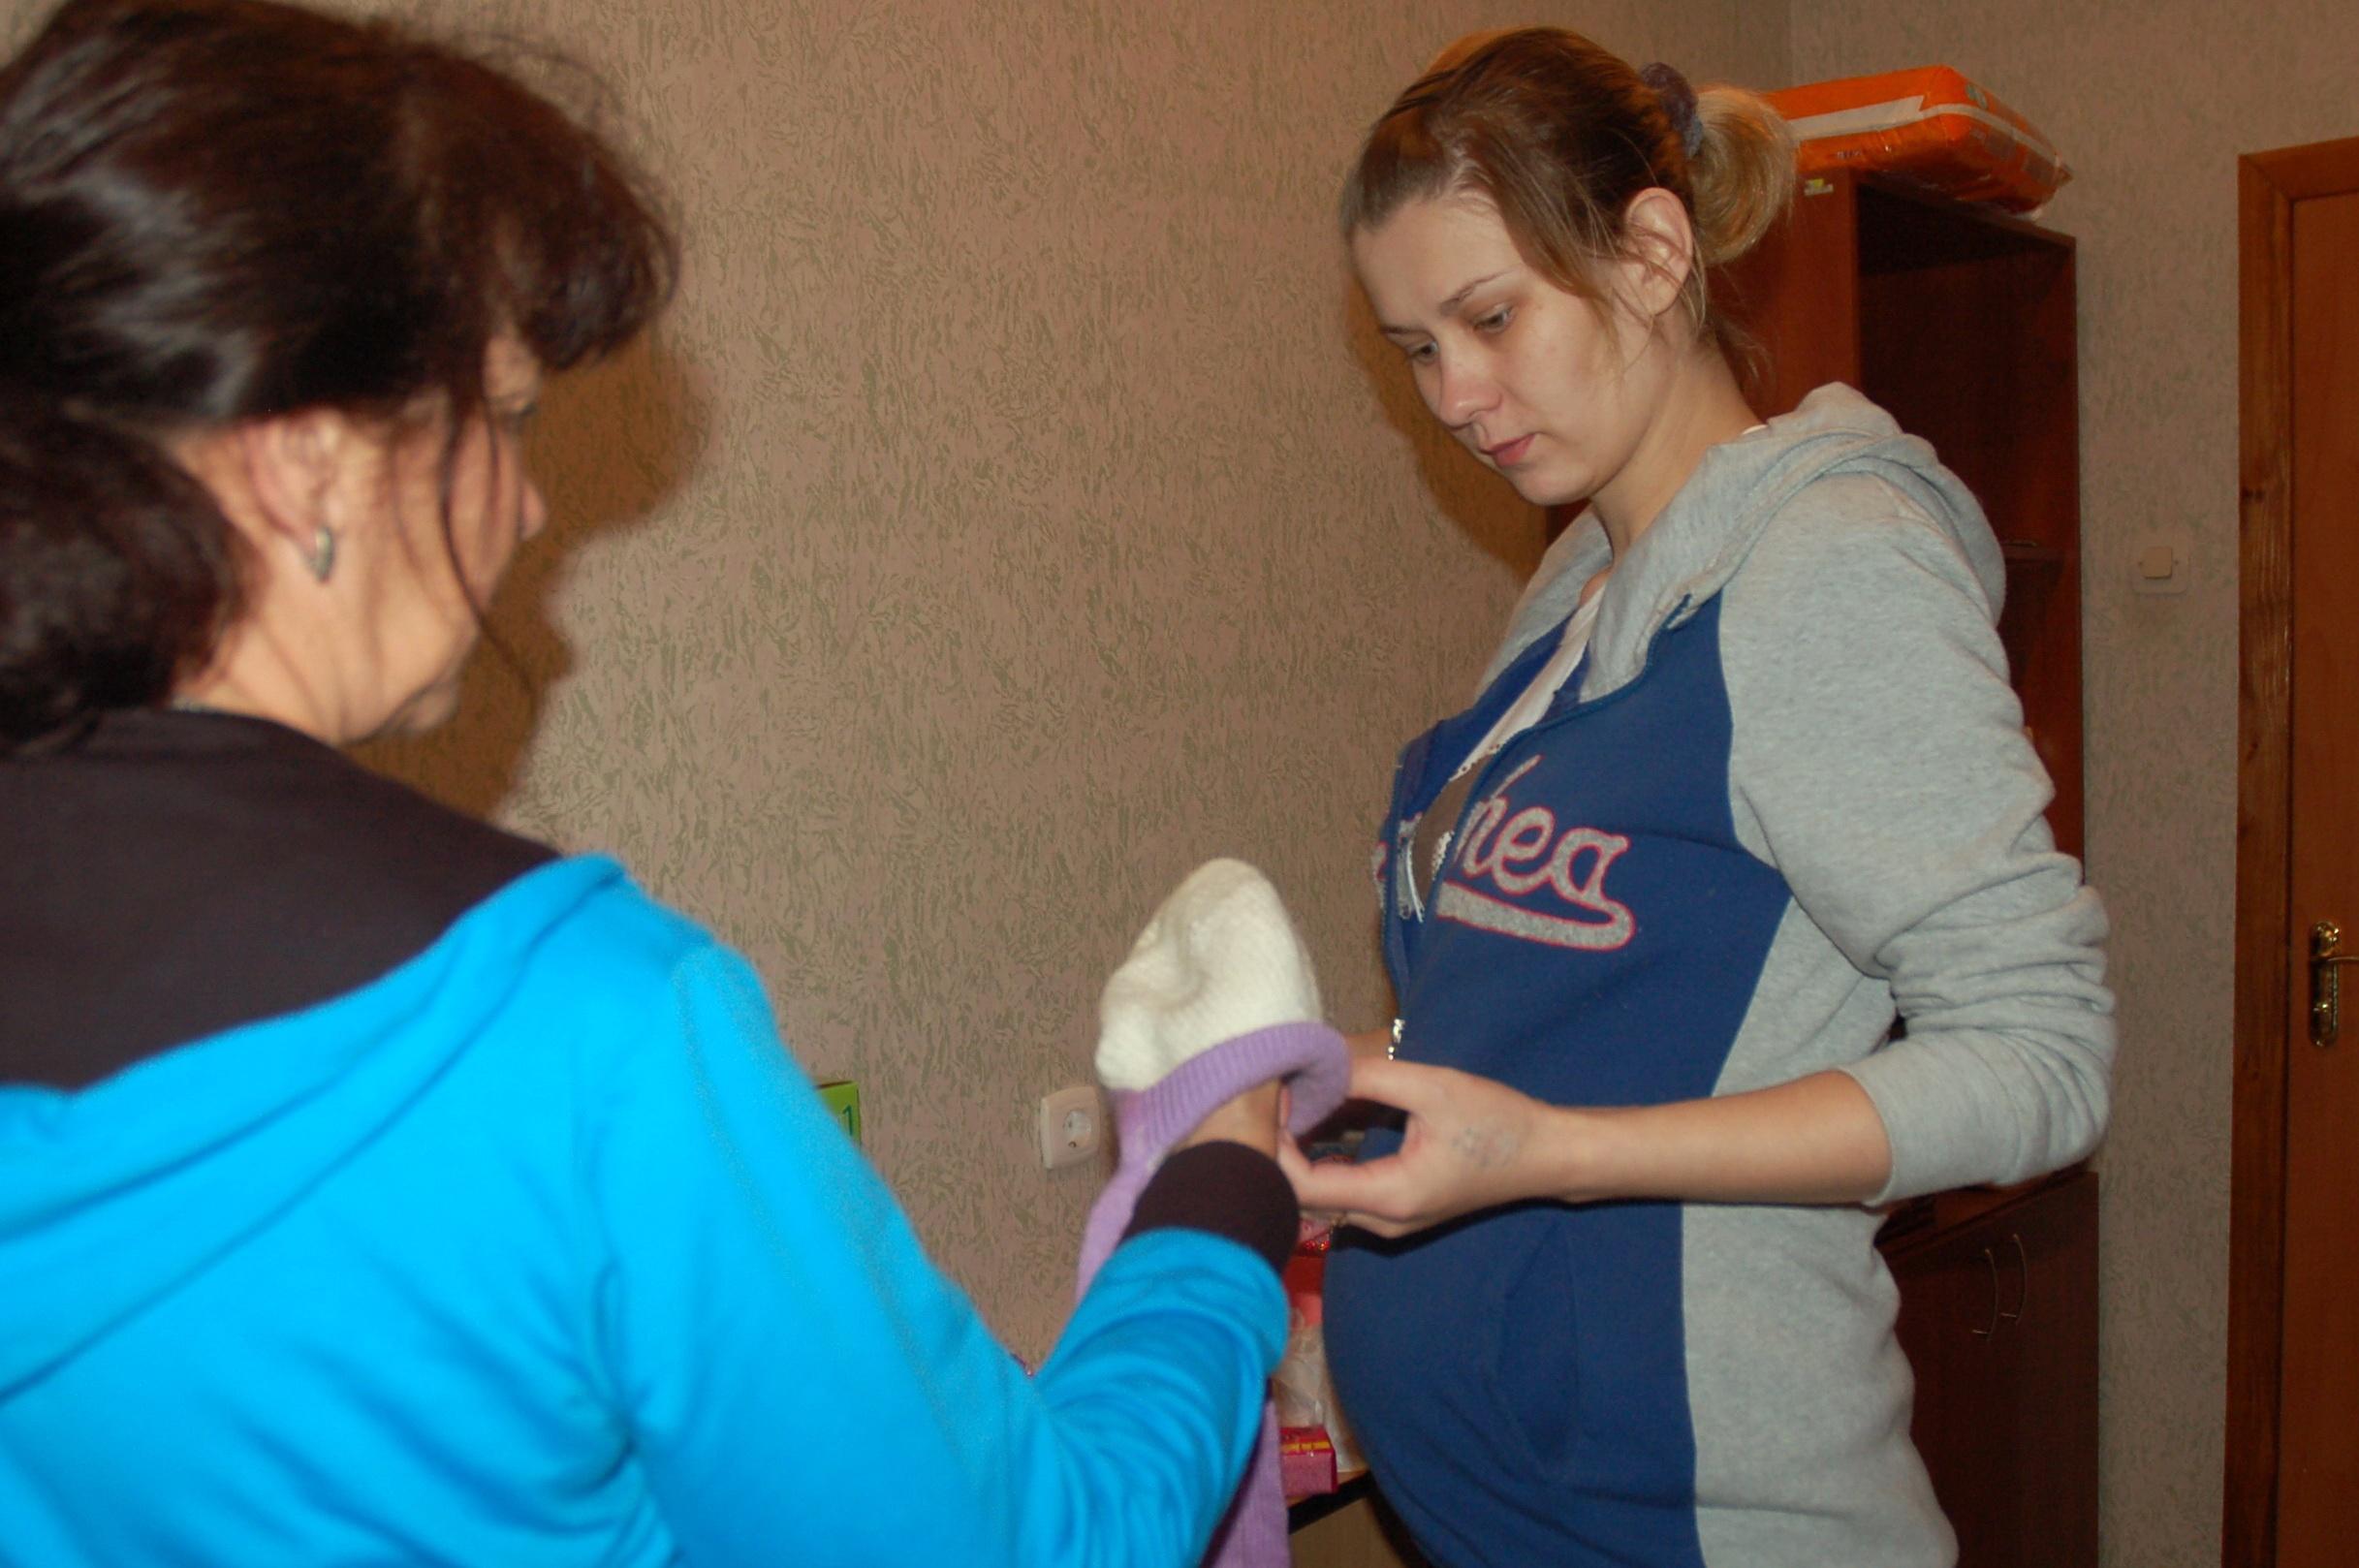 Нина и Кристина выбирают шапочку малышу. Фото: Анна Гин / Gordonua.com